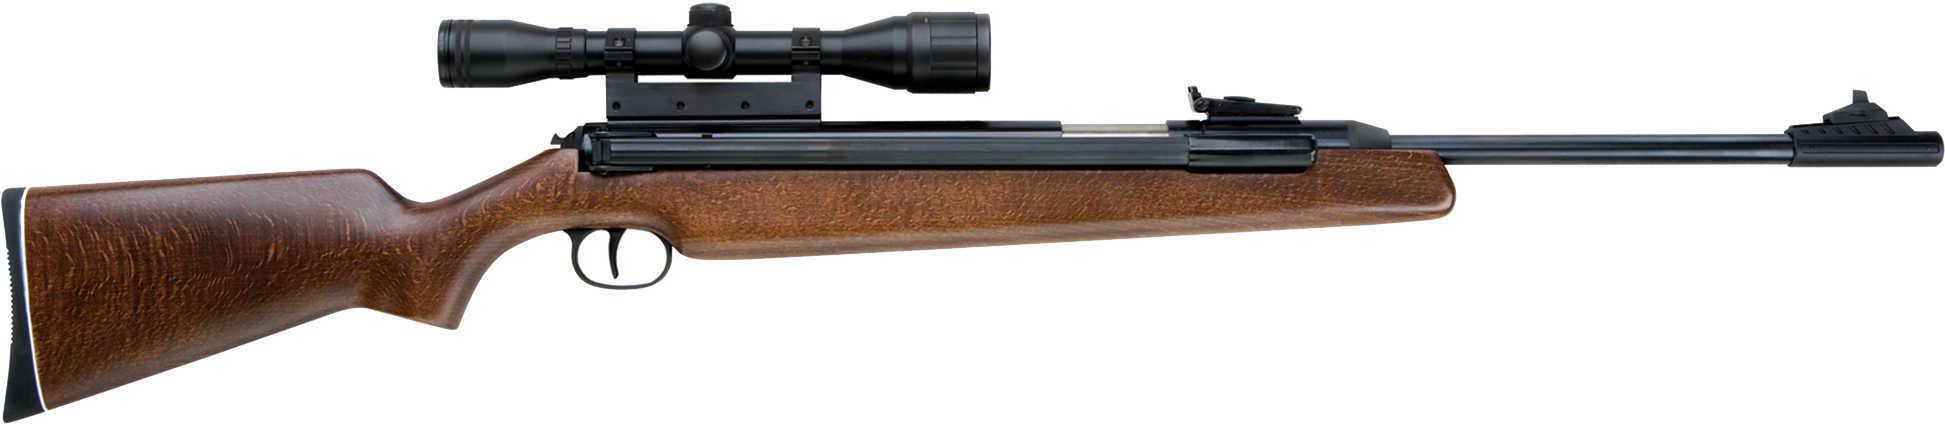 Umarex USA Model 48 .22 Pellet Combo Md: 216-6202